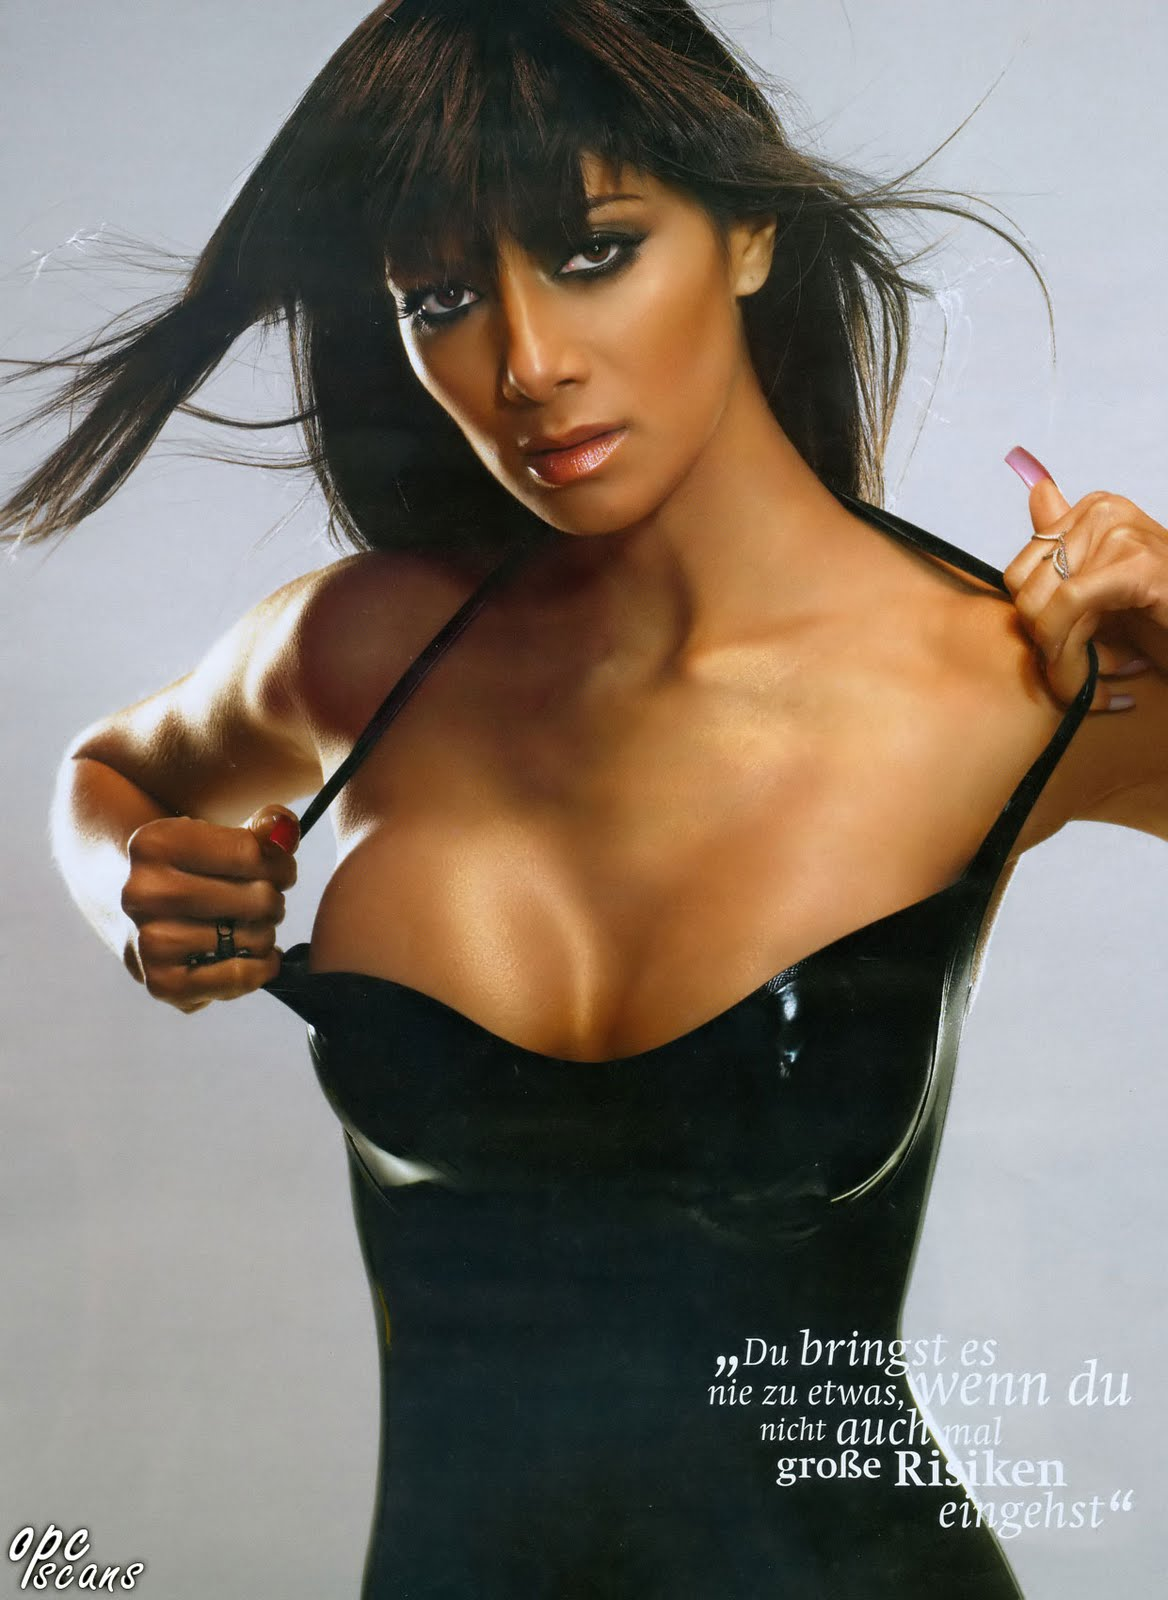 http://3.bp.blogspot.com/_iIGST2VS4mI/TU75dXP5wkI/AAAAAAAAAUA/xP9B7SS_qS8/s1600/Nicole-Scherzinger-Maxim-photoshoot.jpg